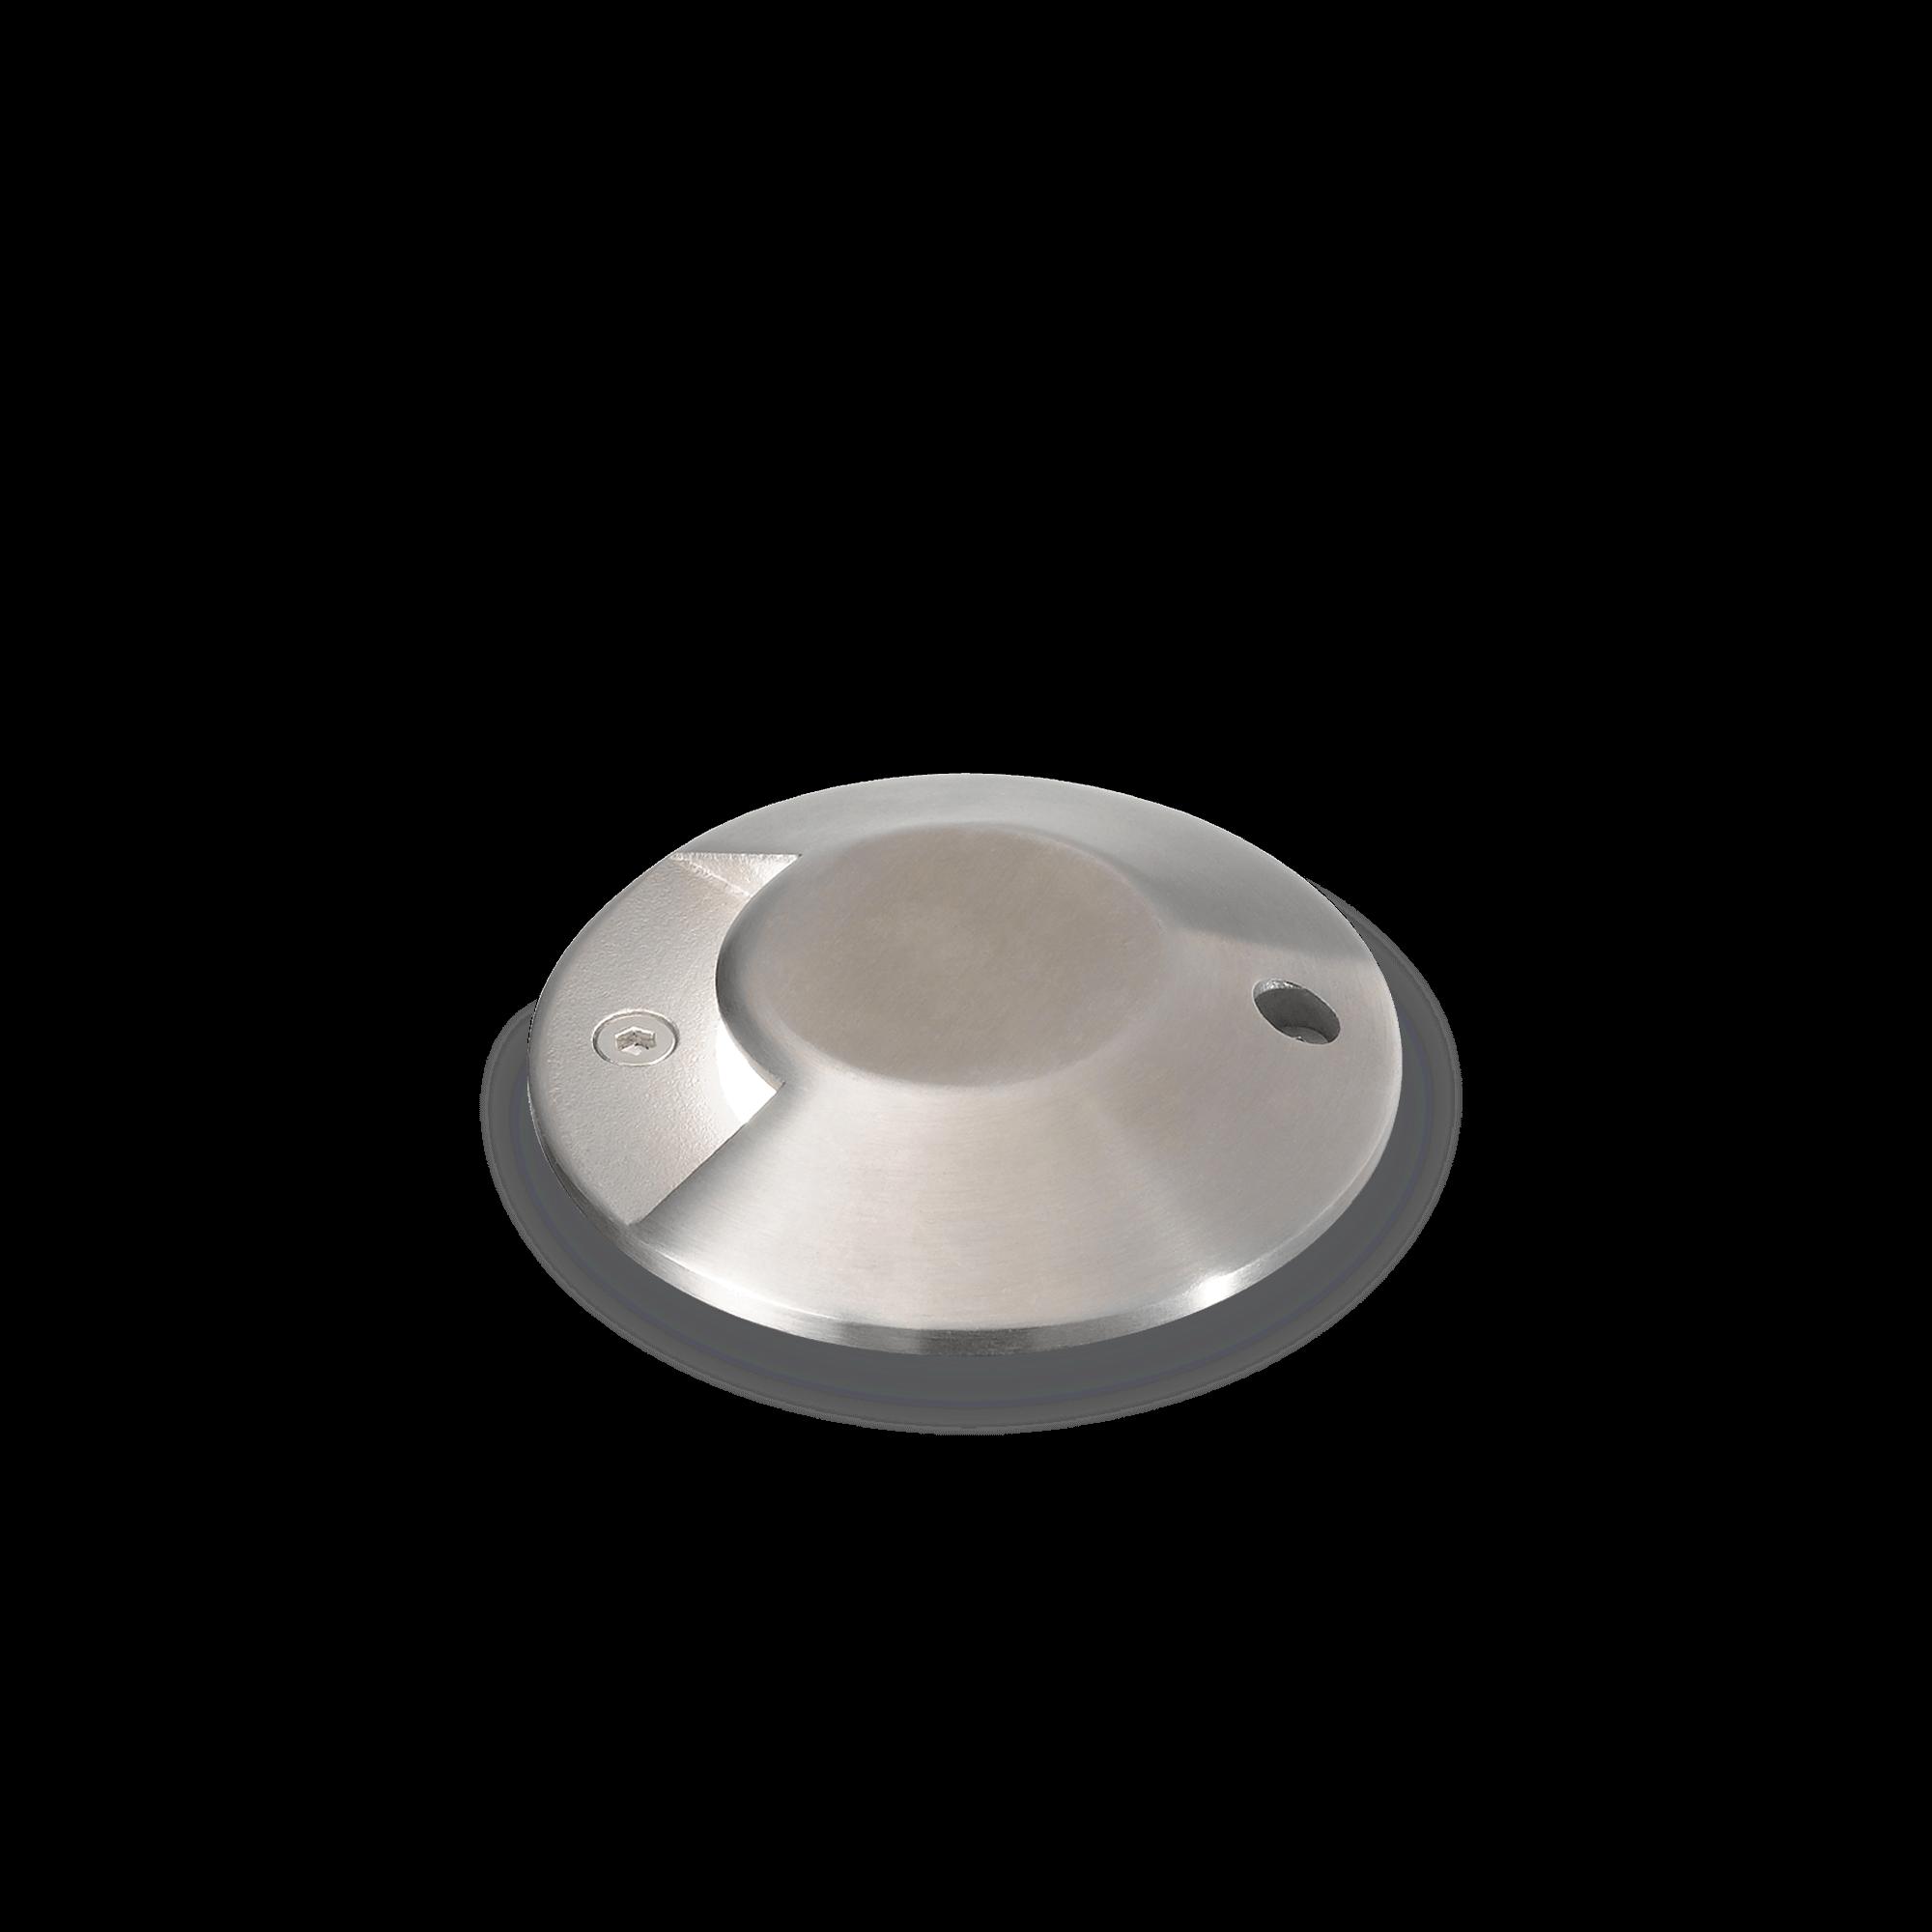 Exteriérové zápustné svítidlo Ideal lux 122014 ROCKET-1 PT1 1xLED 3W / 200lm 4000K IP65